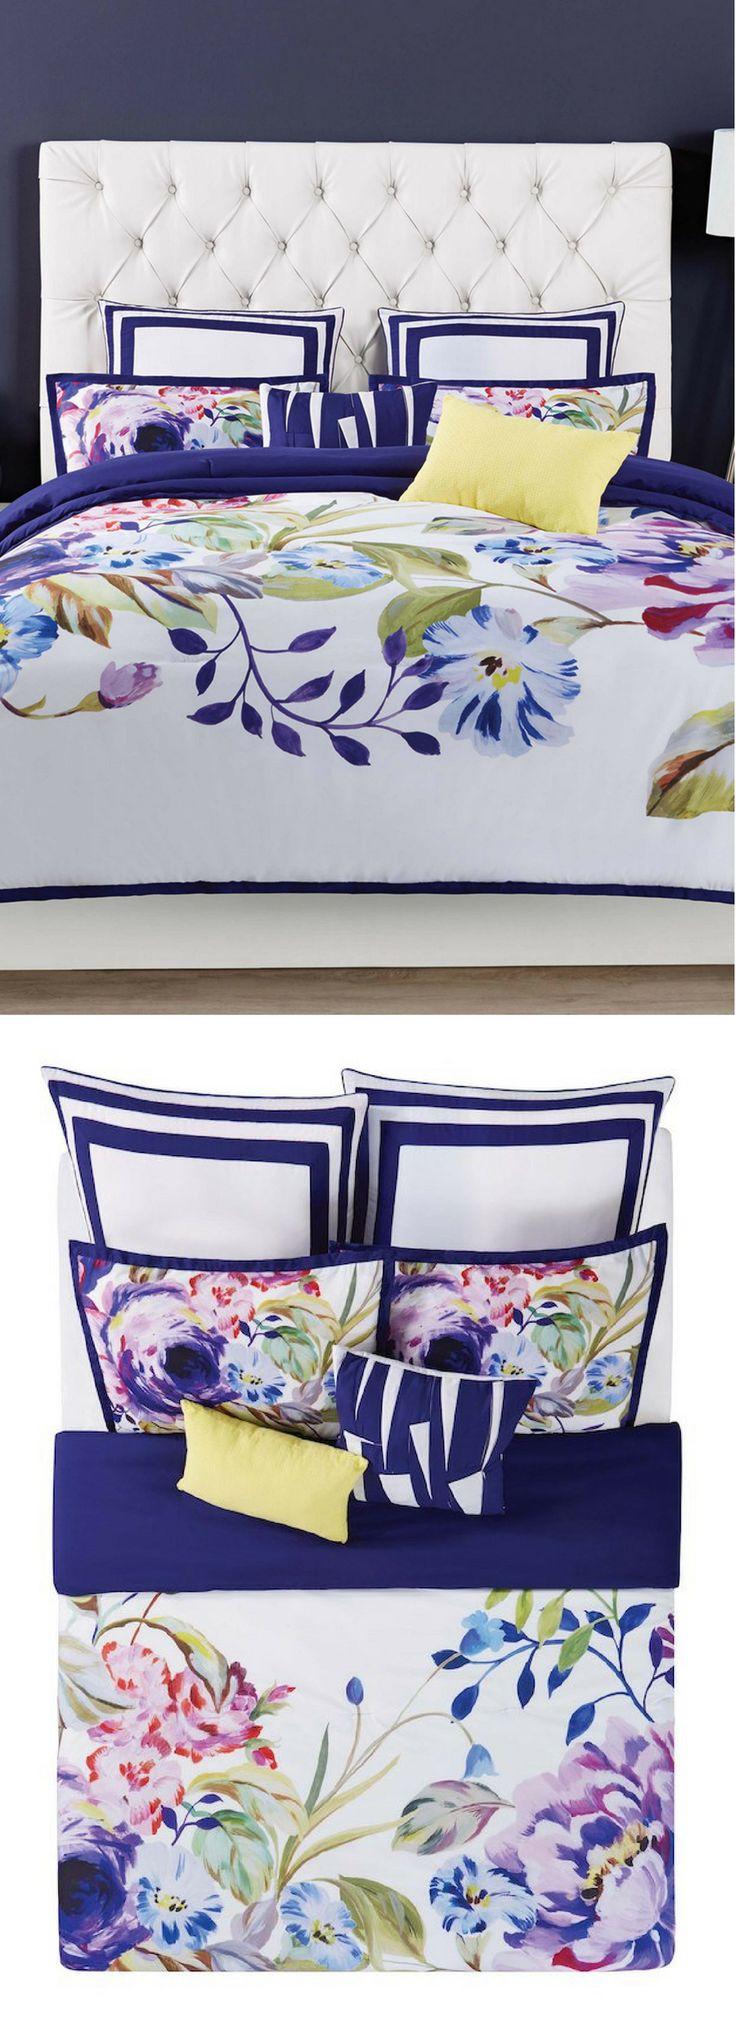 Best Garden Bloom Comforter Set I ever saw! So beautiful! Great gift idea! NNT #Afflink #florals #gardens #comforters #giftideas #GIFTIDEA #gift #christmasgifts #homedecor #homedesign #homedecorideas #bedroom #bedroomdecor comforter sets | comforter sets boho |  comforter sets rustic | comforter sets for couples | Comforter Sets | COMFORTER SET'S | Comforter sets | great gift ideas | great gift ideas for women | great gift ideas for christmas | great gift ideas for friends |  Great Gift…